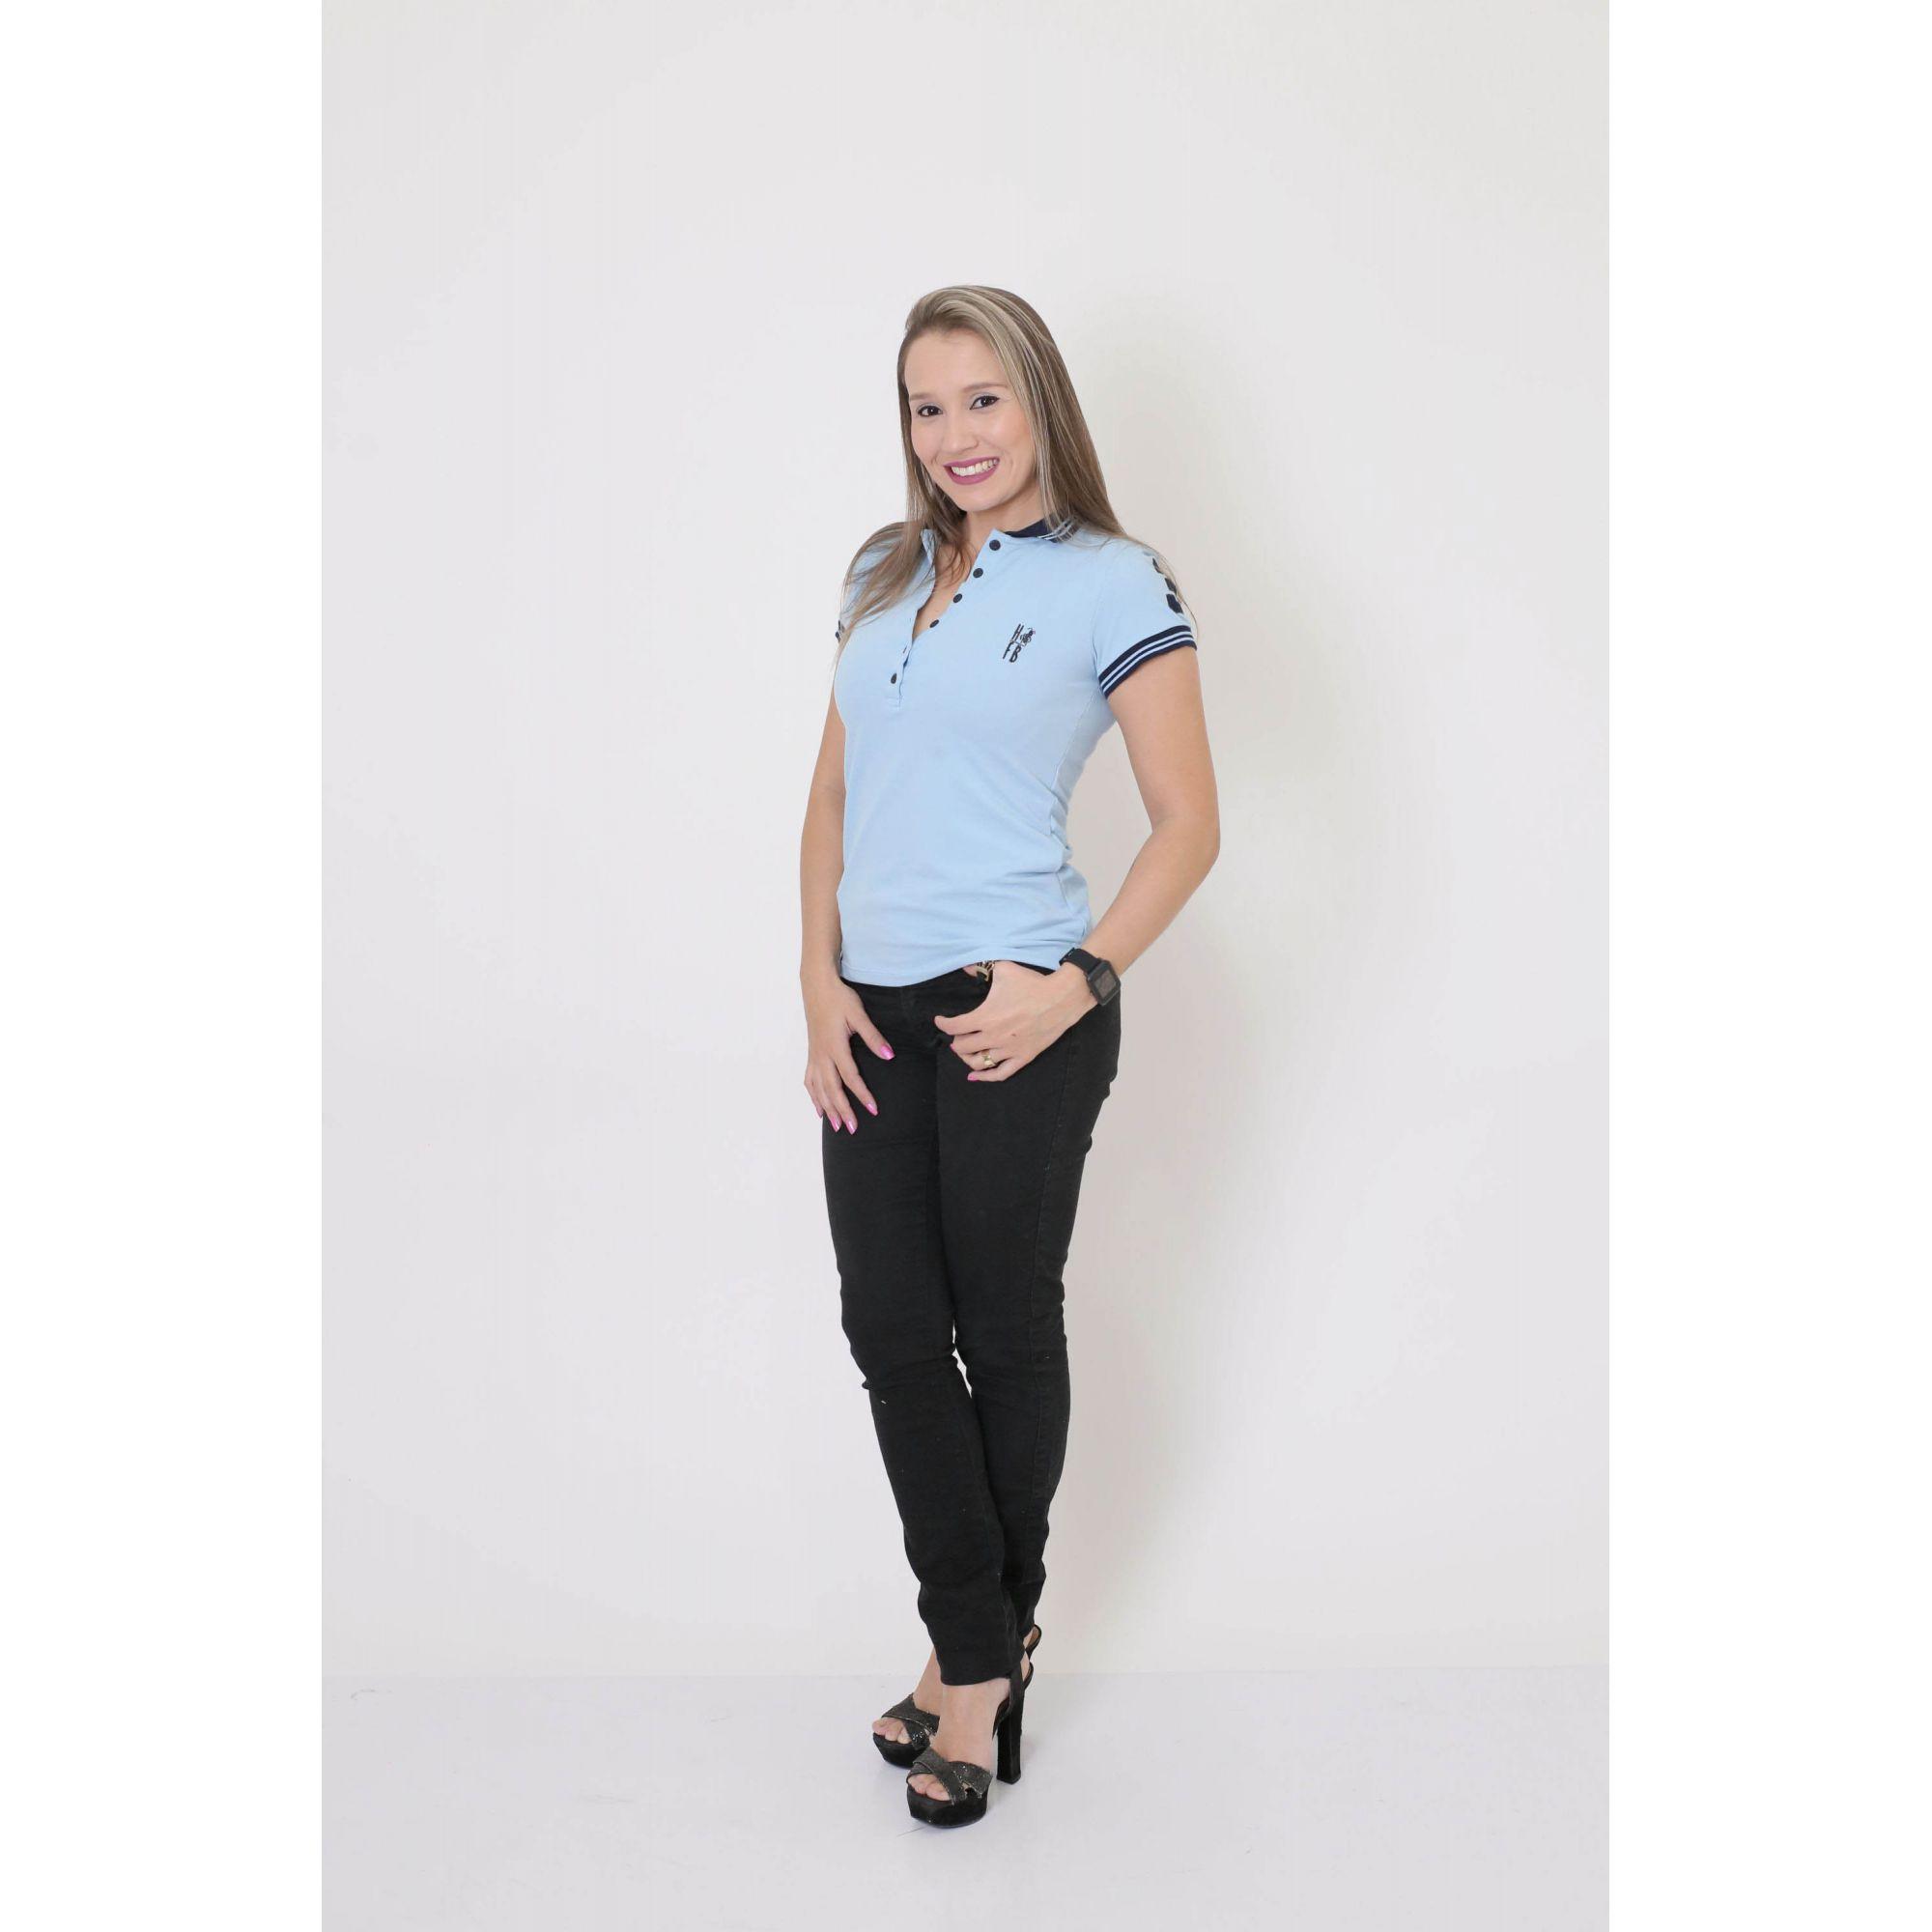 MÃE E FILHO > Kit 02 Peças - Camisas ou Body Polo Azul Nobreza [Coleção Tal Mãe Tal Filho]  - Heitor Fashion Brazil